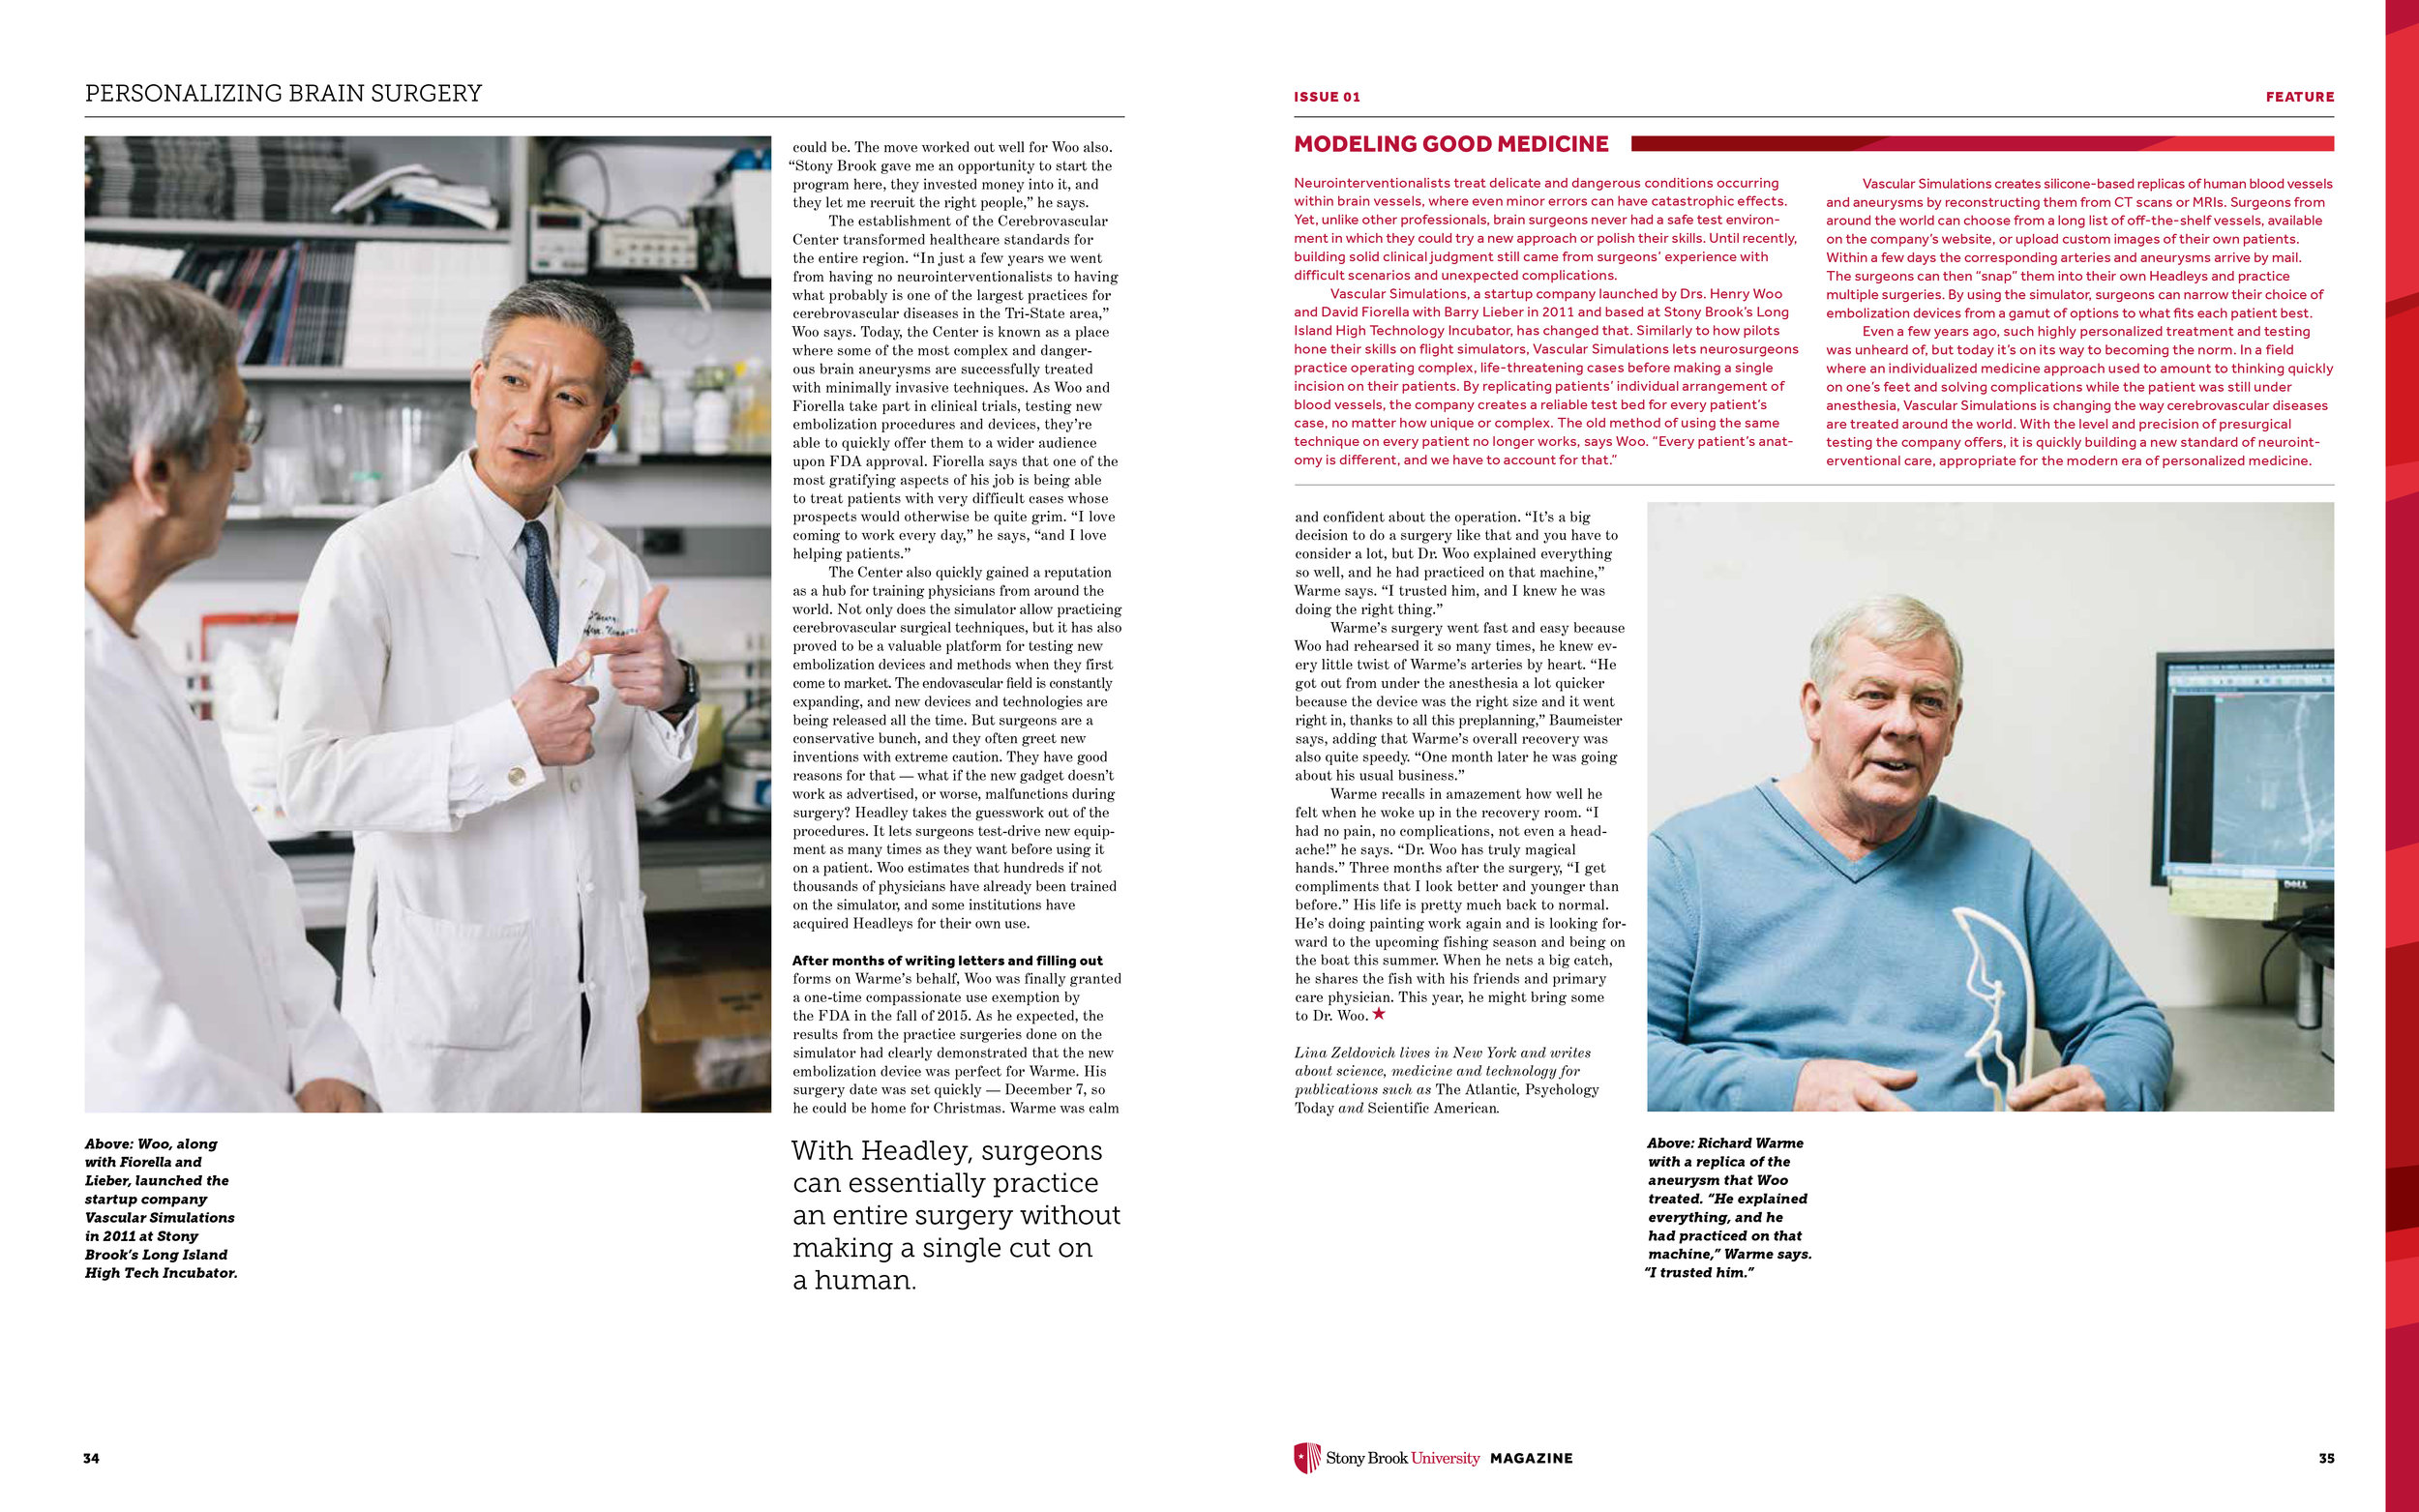 SBU_Magazine_Issue01_Final-19.jpg